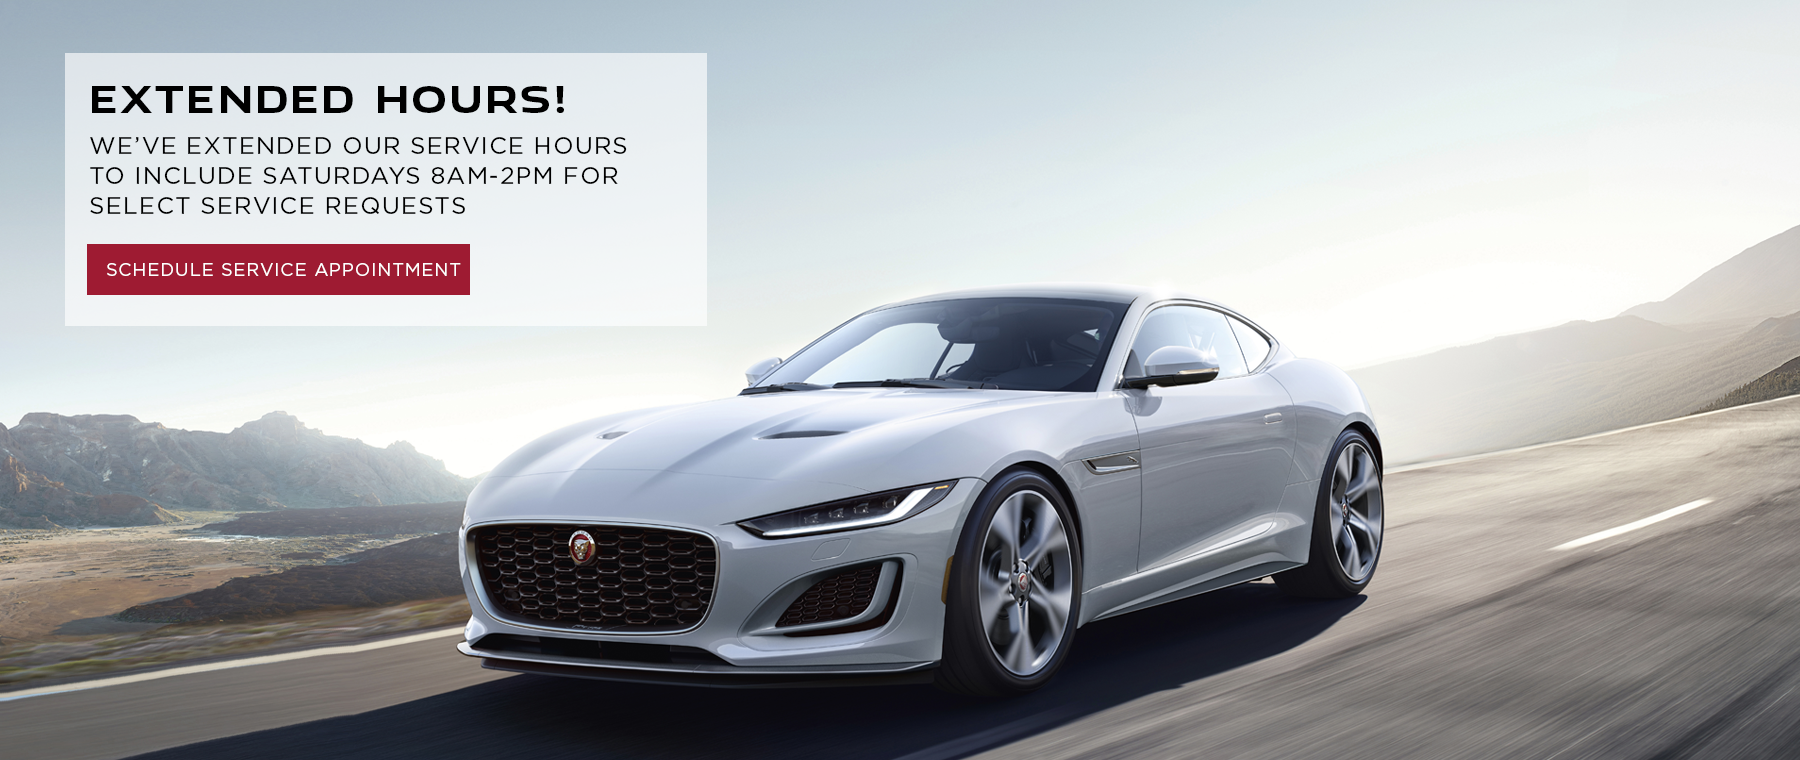 Jaguar Extended Service Hours